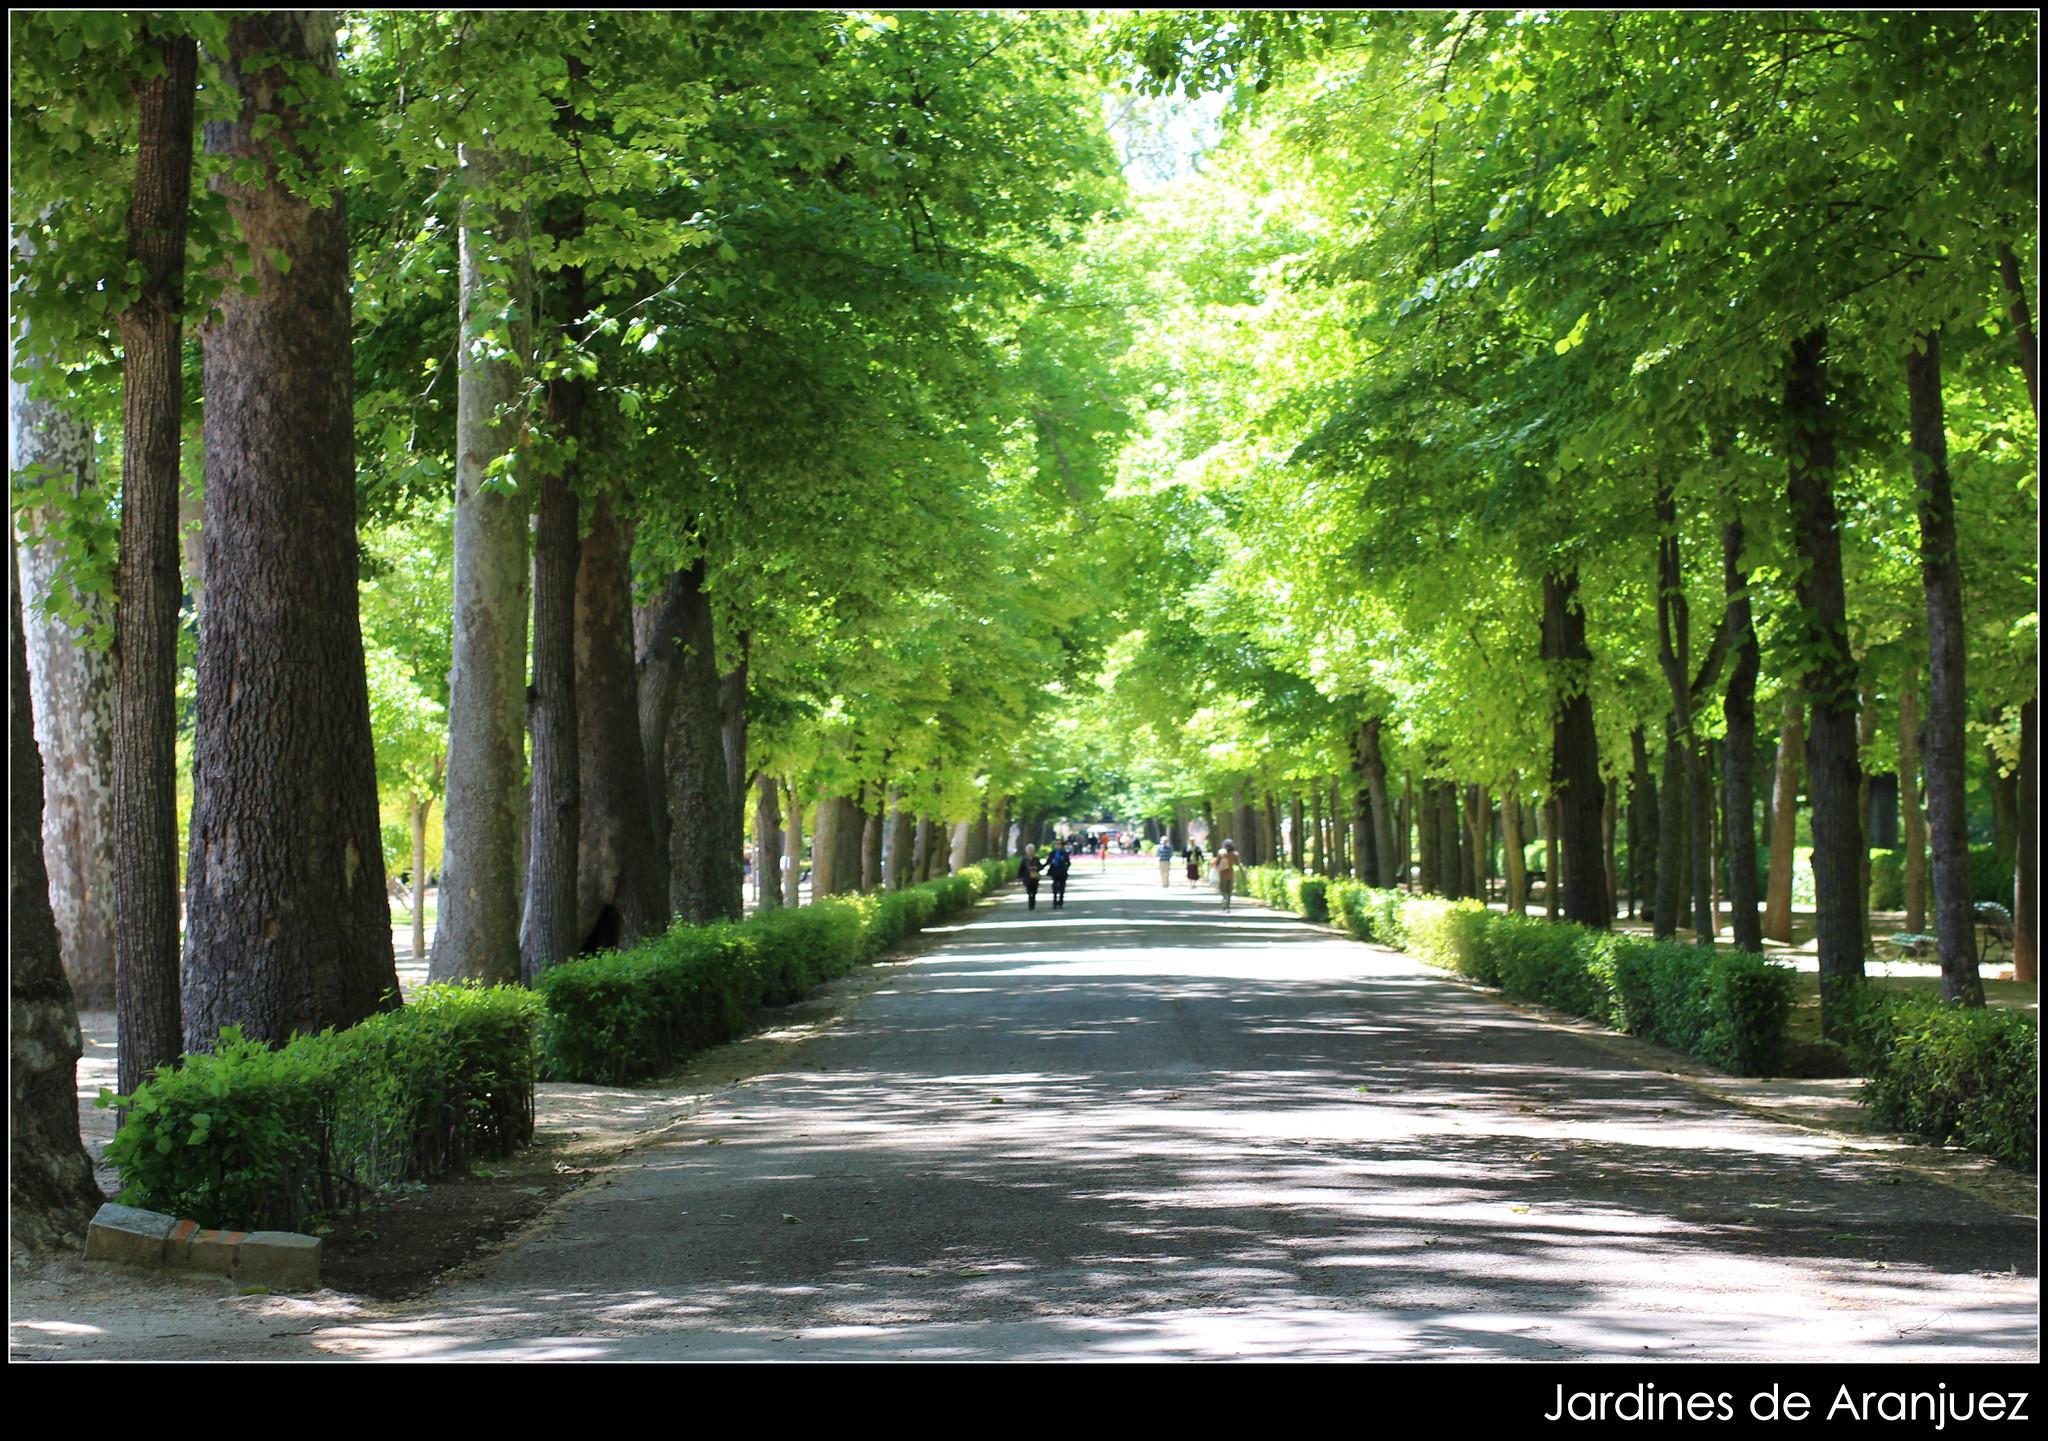 Jardines de aranjuez en mayo jardines de aranjuez en mayo flickr photo sharing for Jardines de aranjuez horario